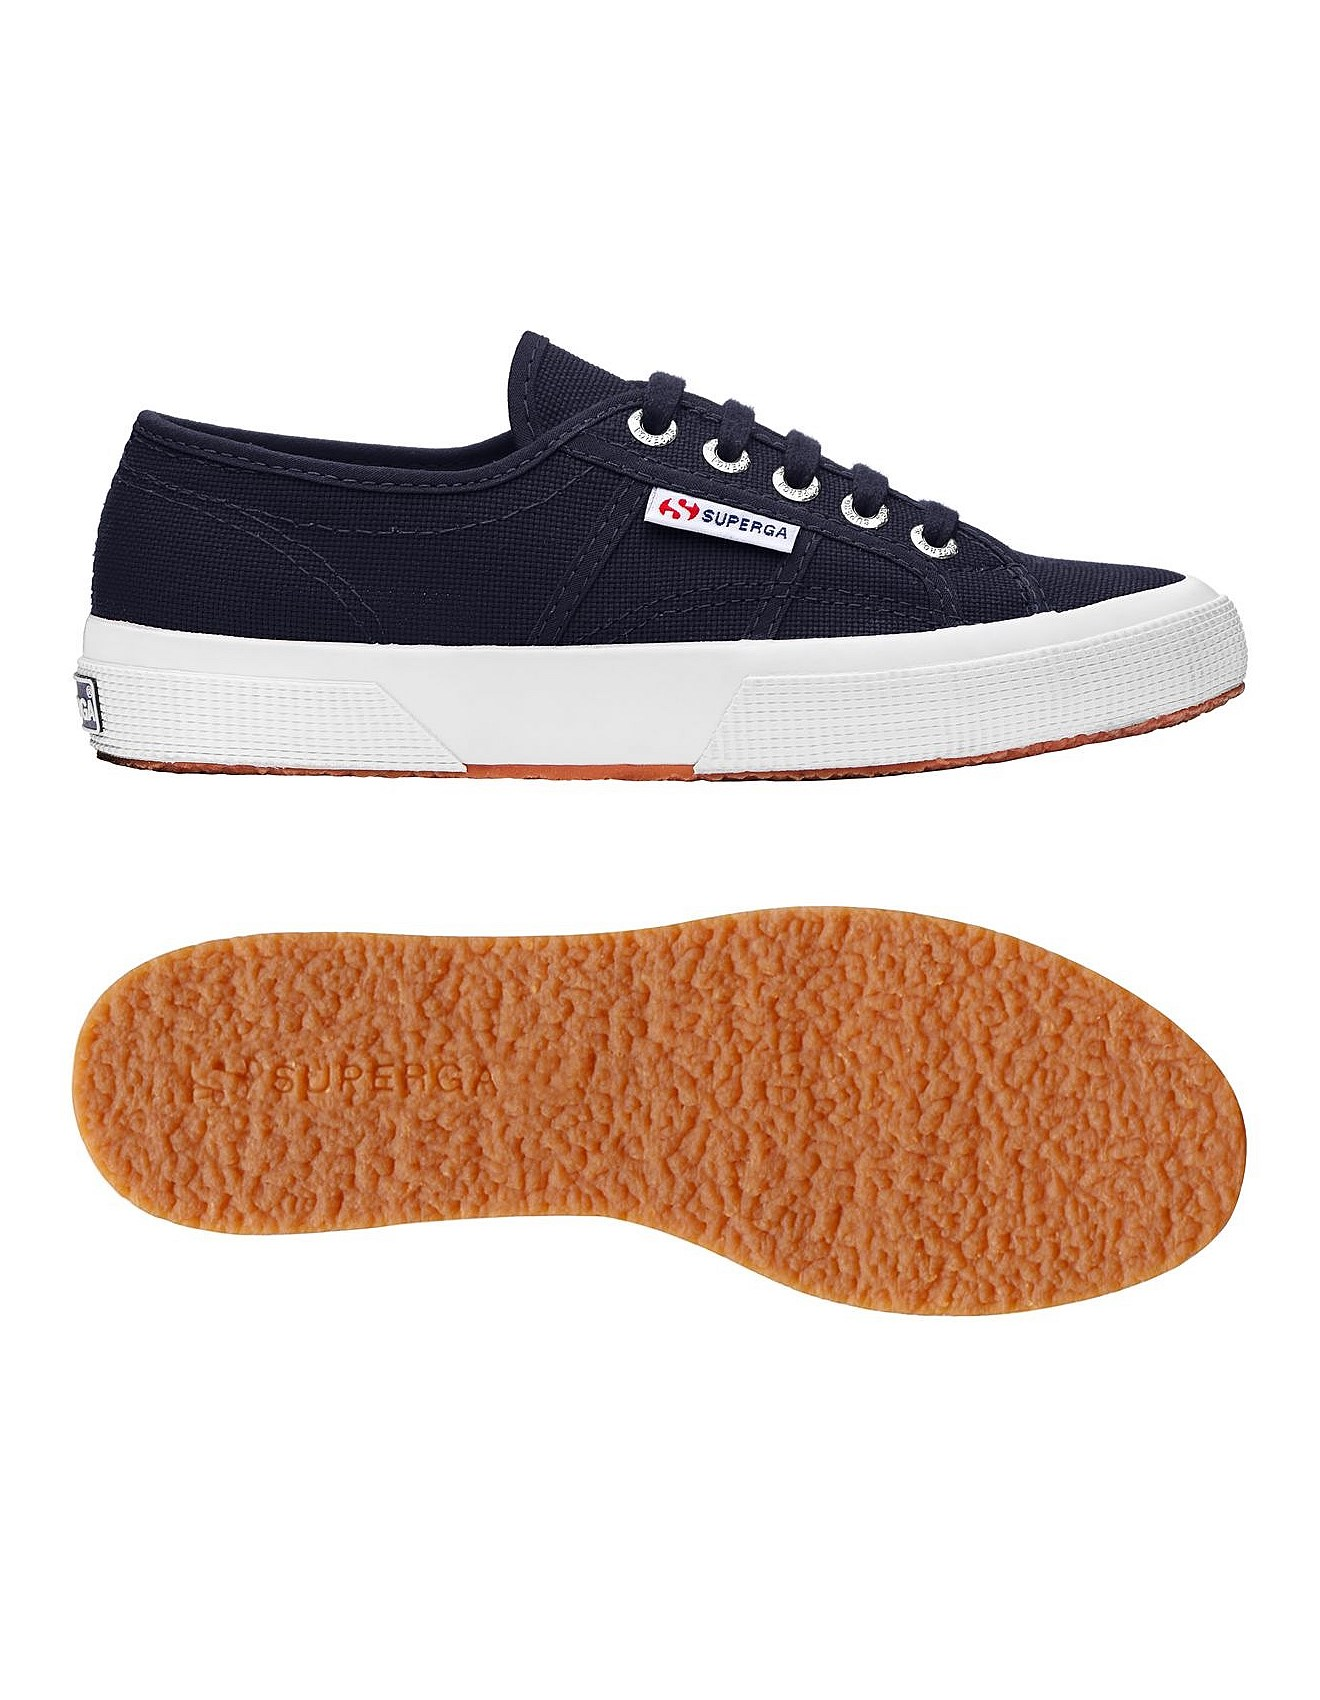 fe65683dd Superga | Buy Superga Shoes Online Australia | David Jones - 2750 ...